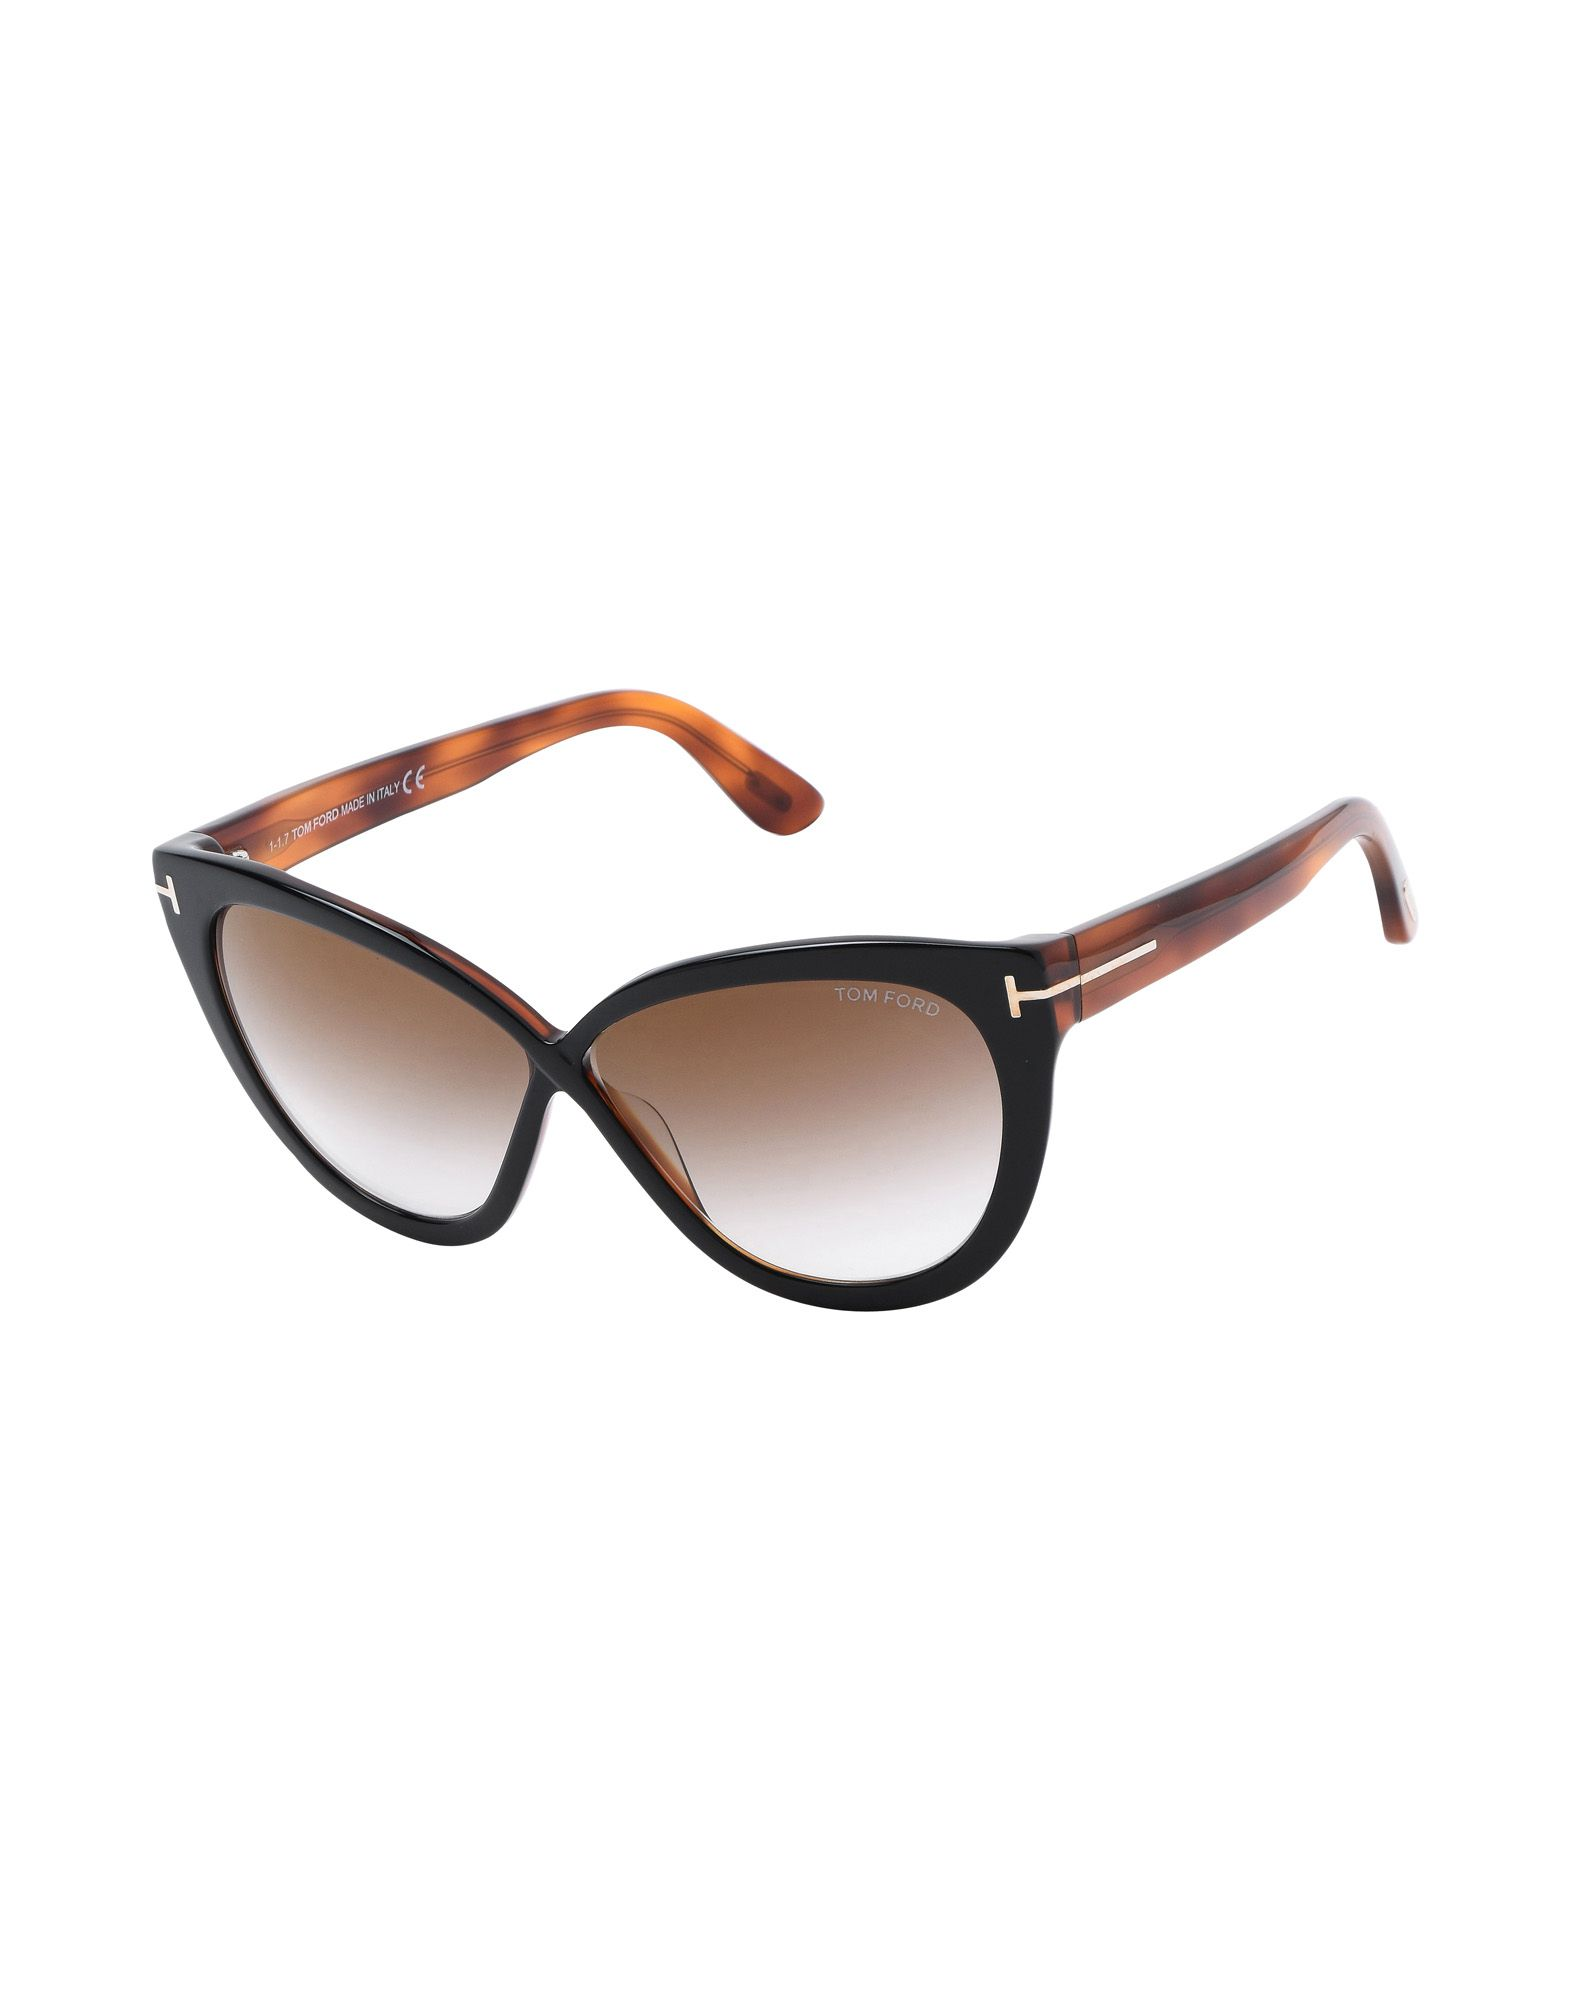 TOM FORD Солнечные очки солцезащитные очки